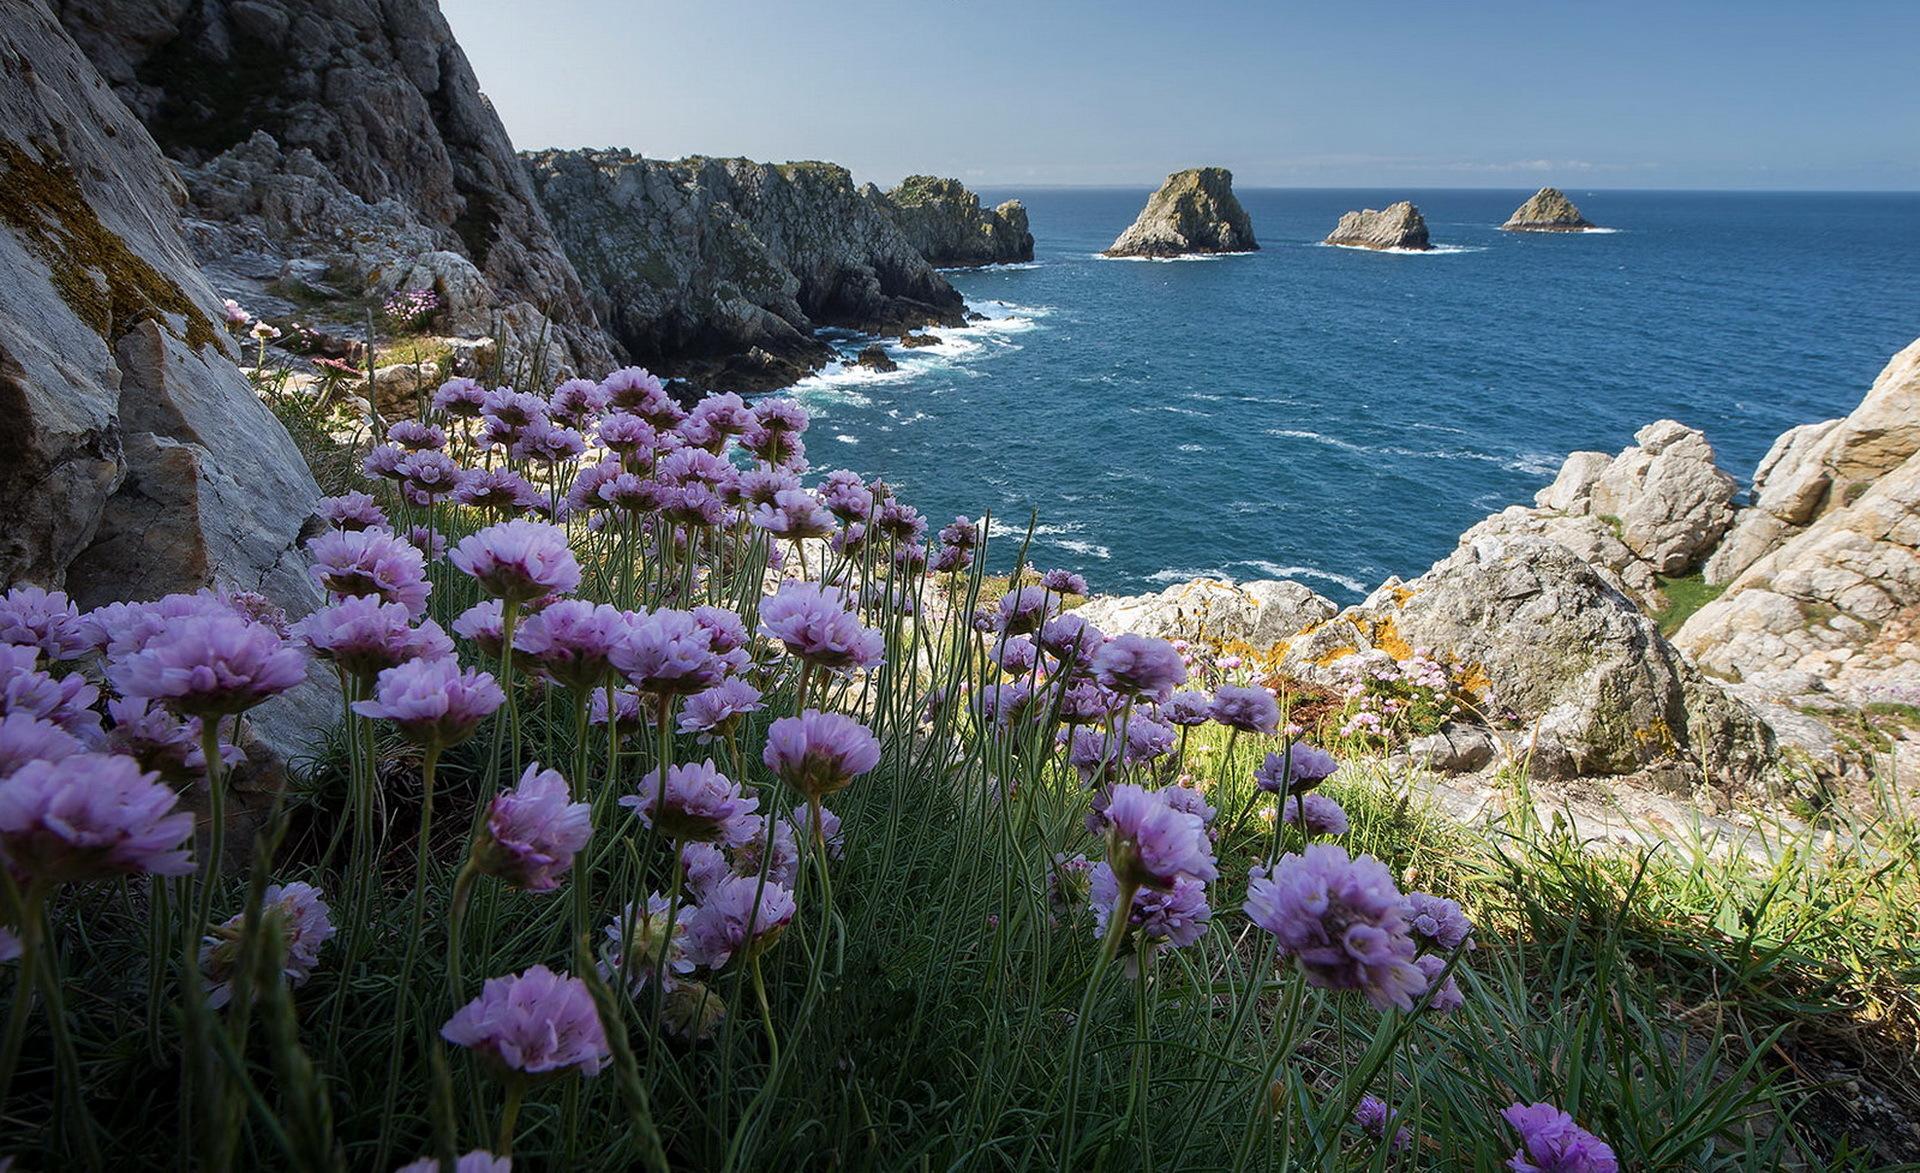 Картинка с морем цветов